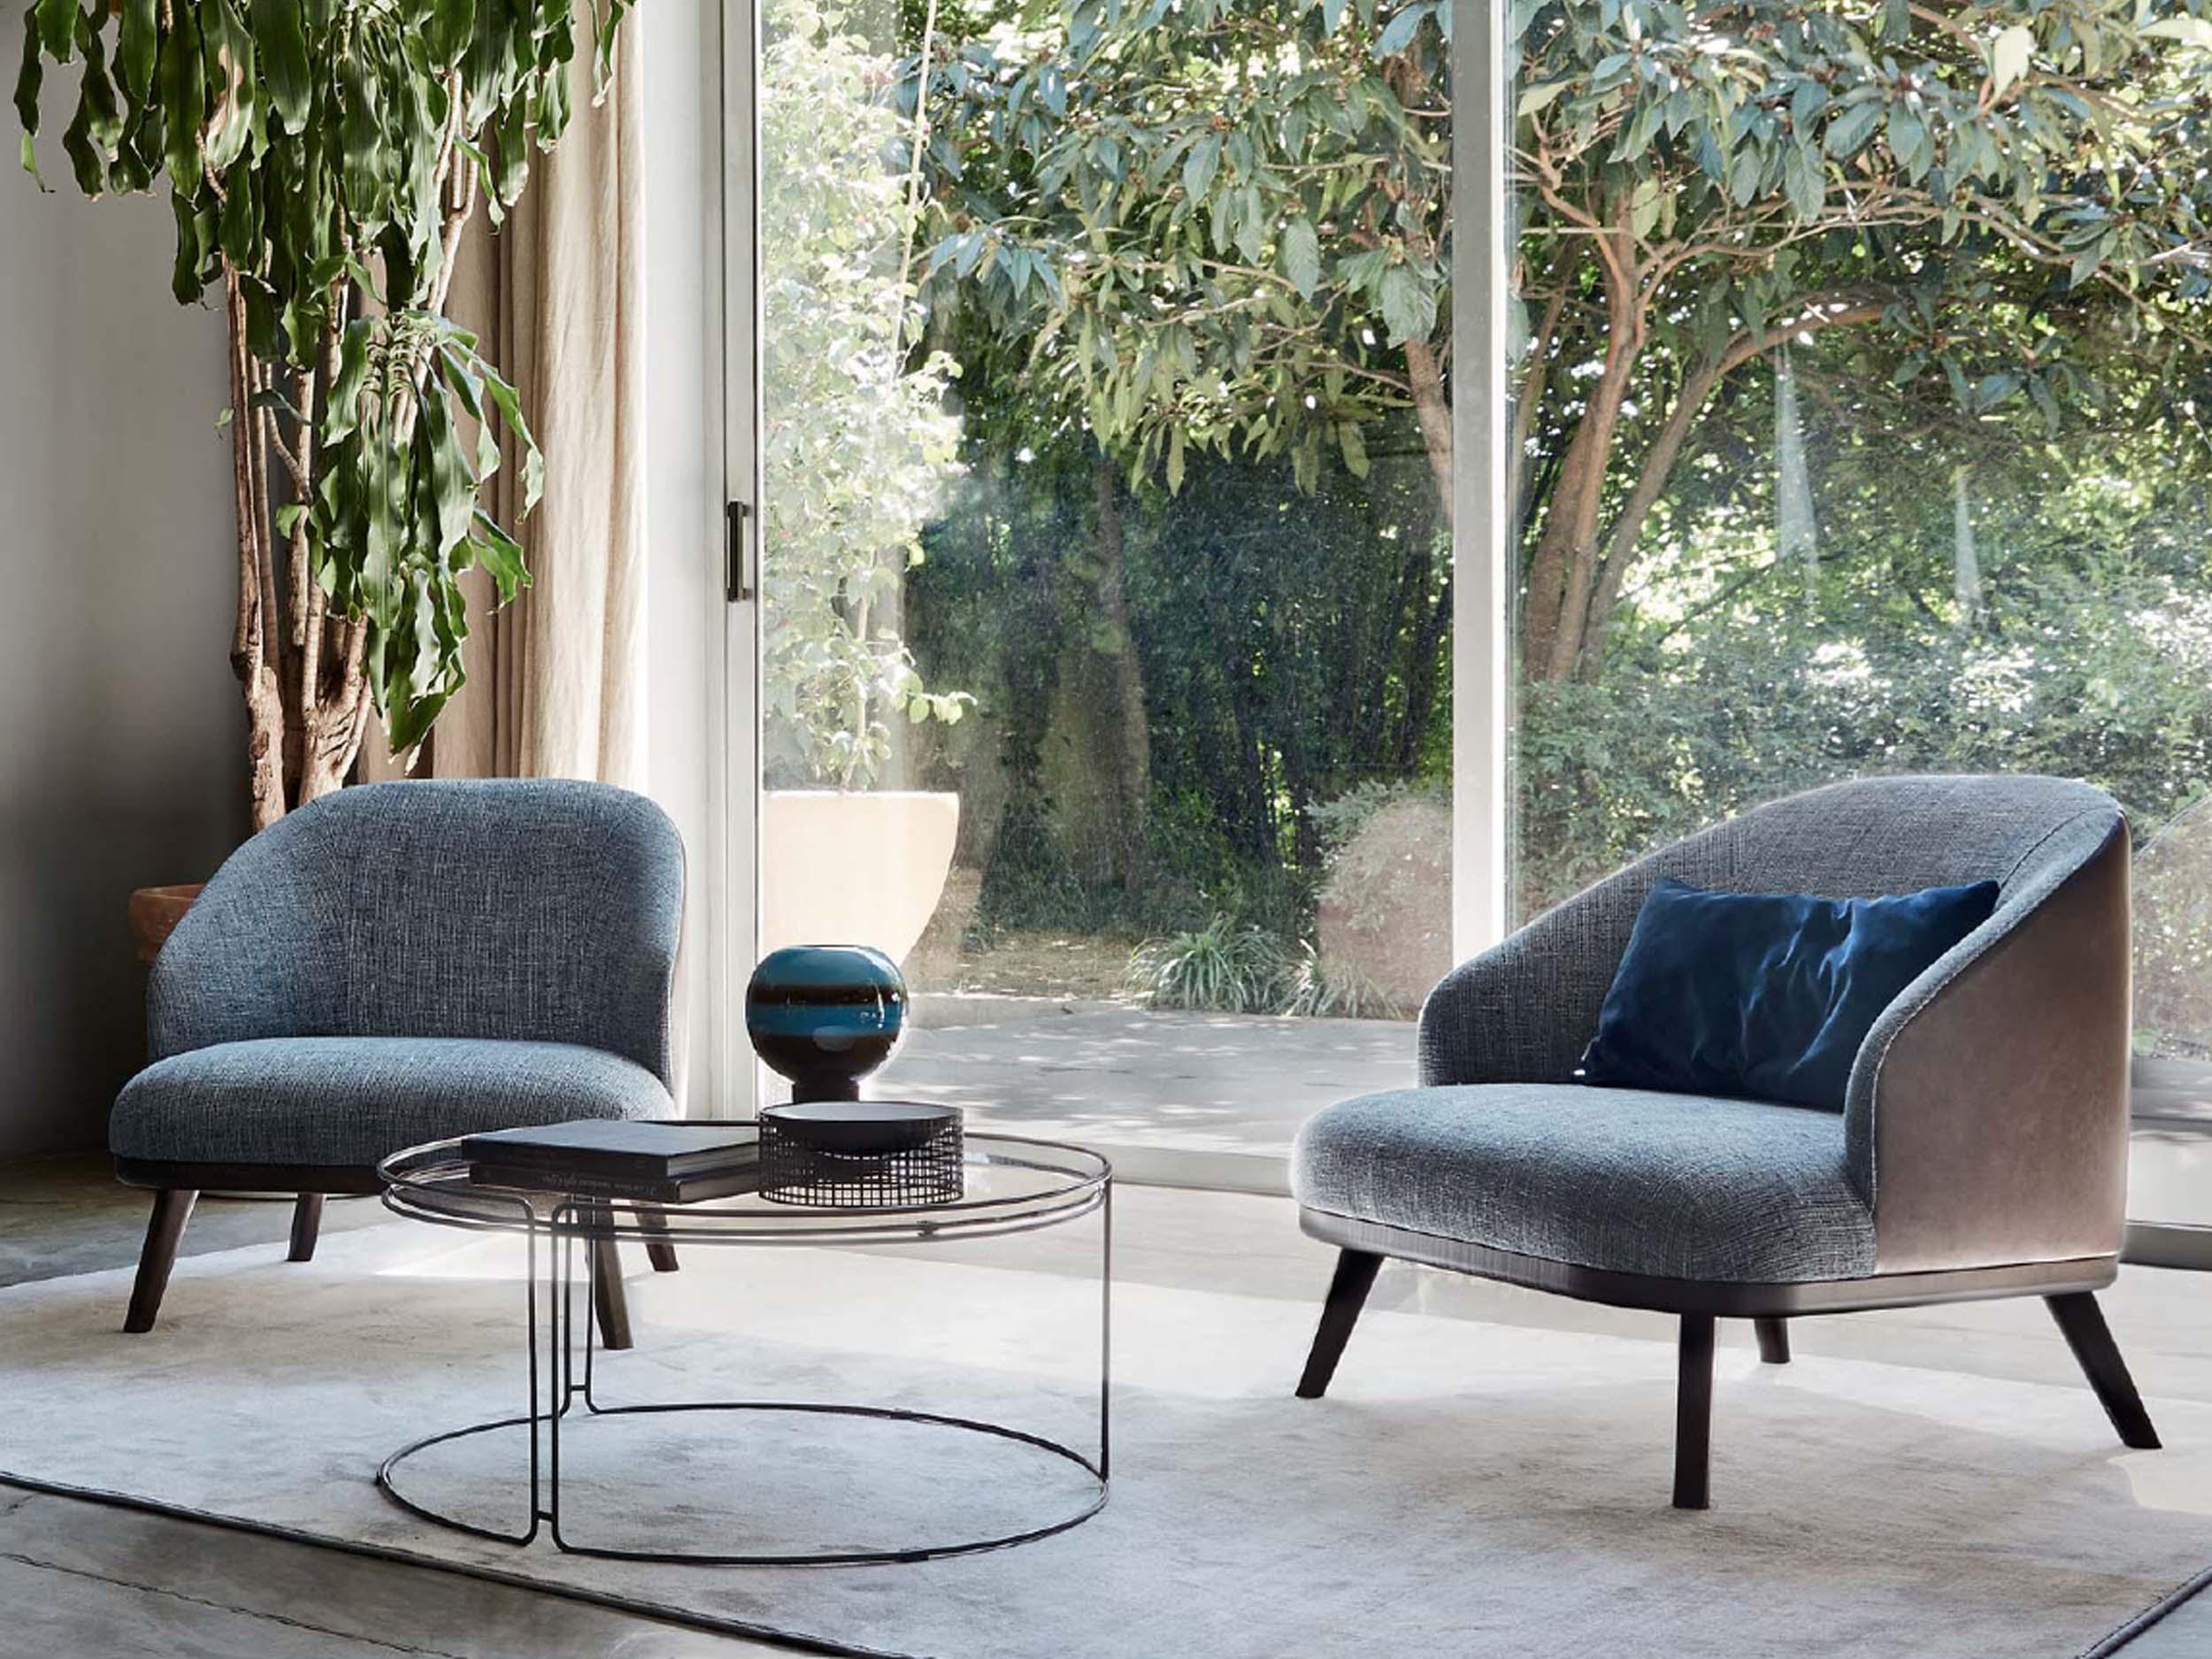 St. Tropez Arm Chair